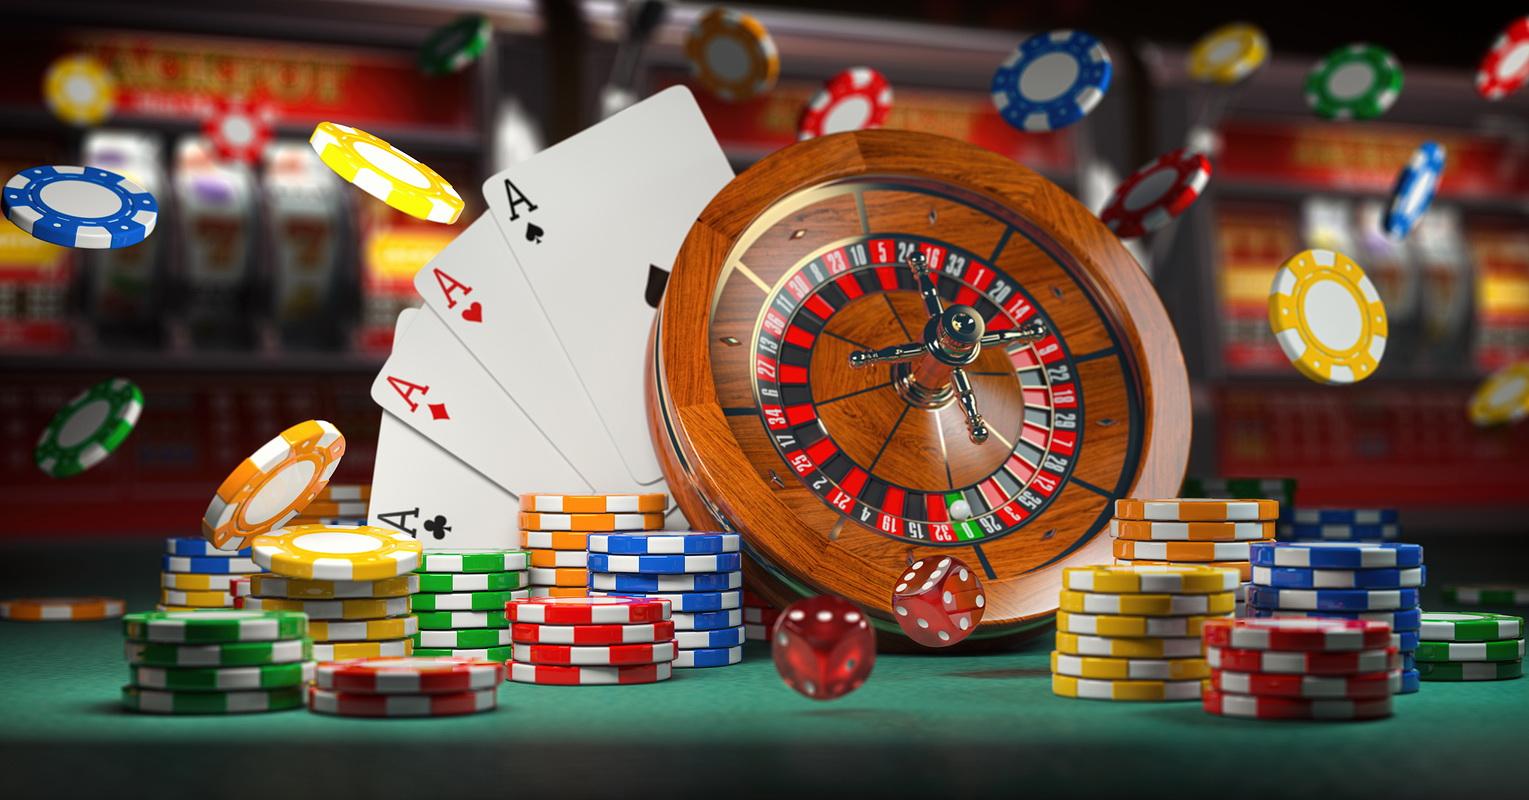 Earn easy money by having fun and betting on UFA